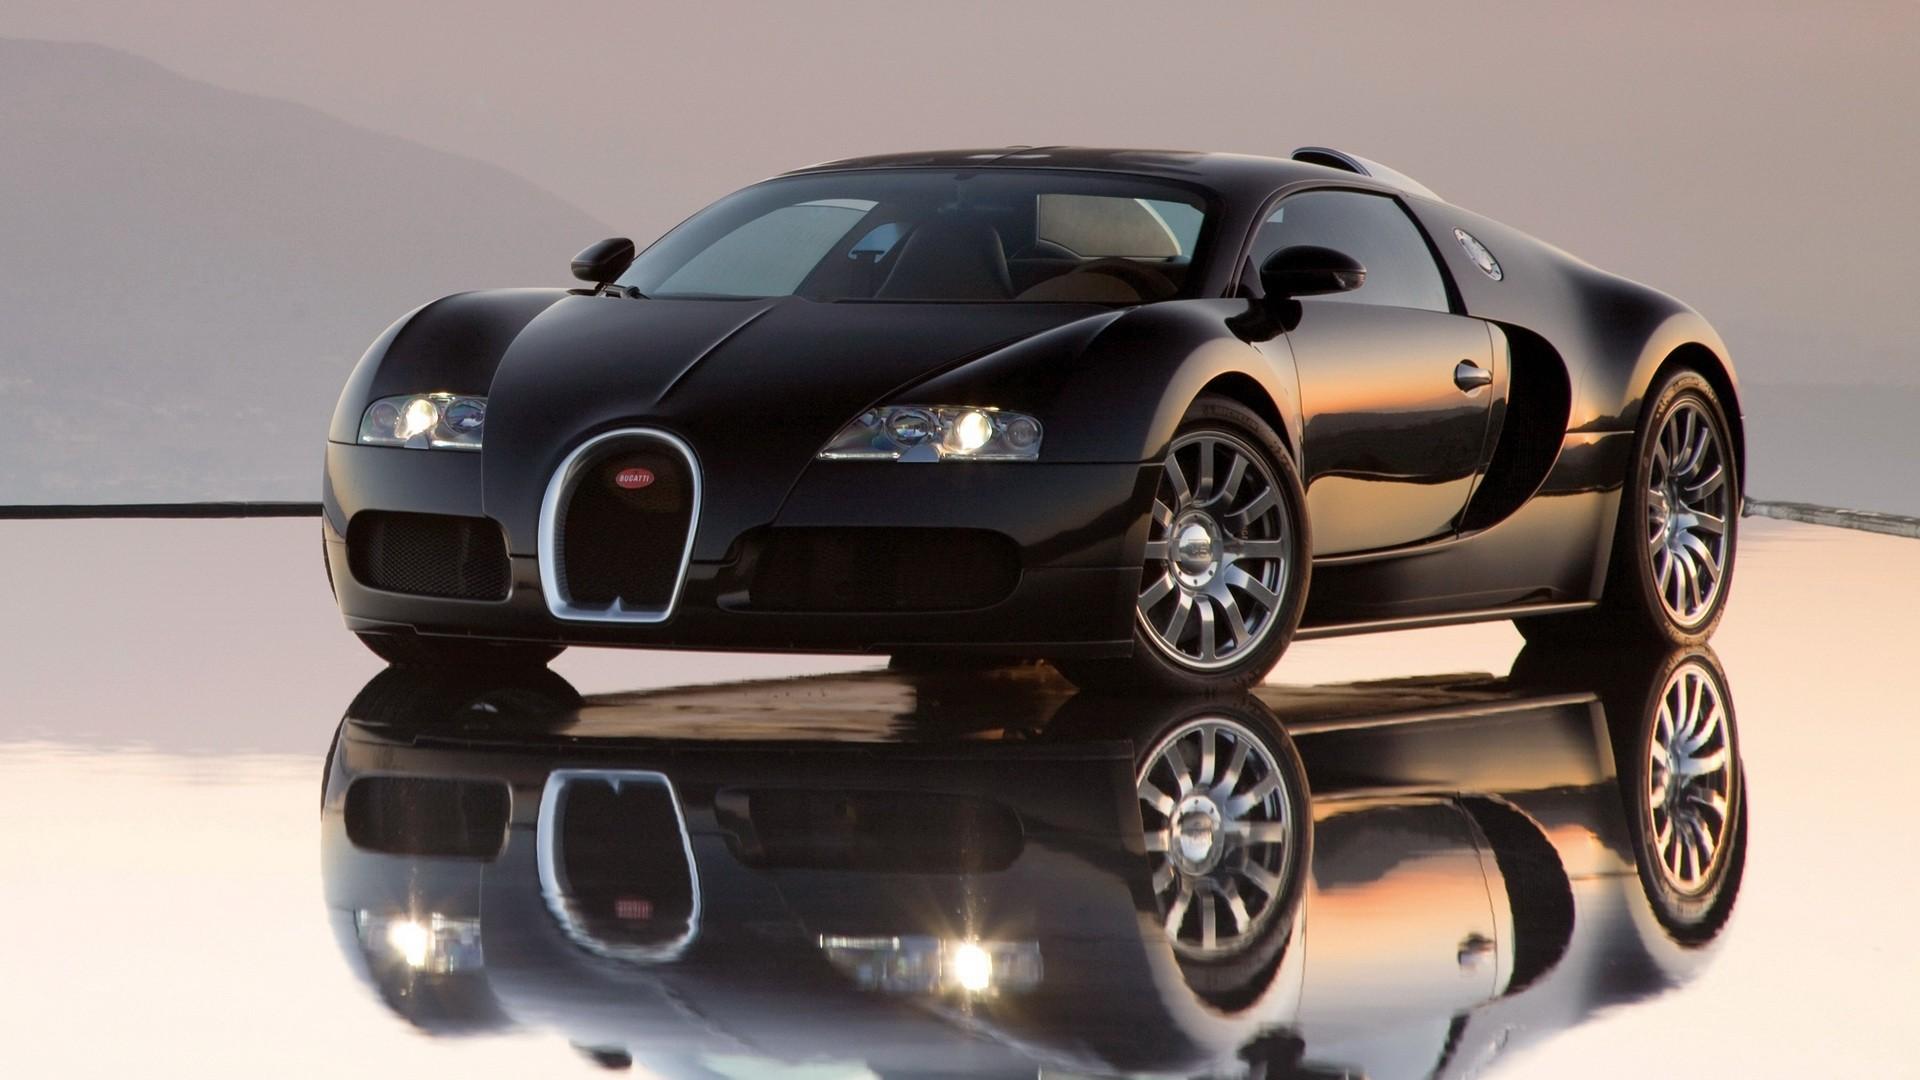 bugatti veyron full hd wallpaper and background 1920x1080 id 331722. Black Bedroom Furniture Sets. Home Design Ideas